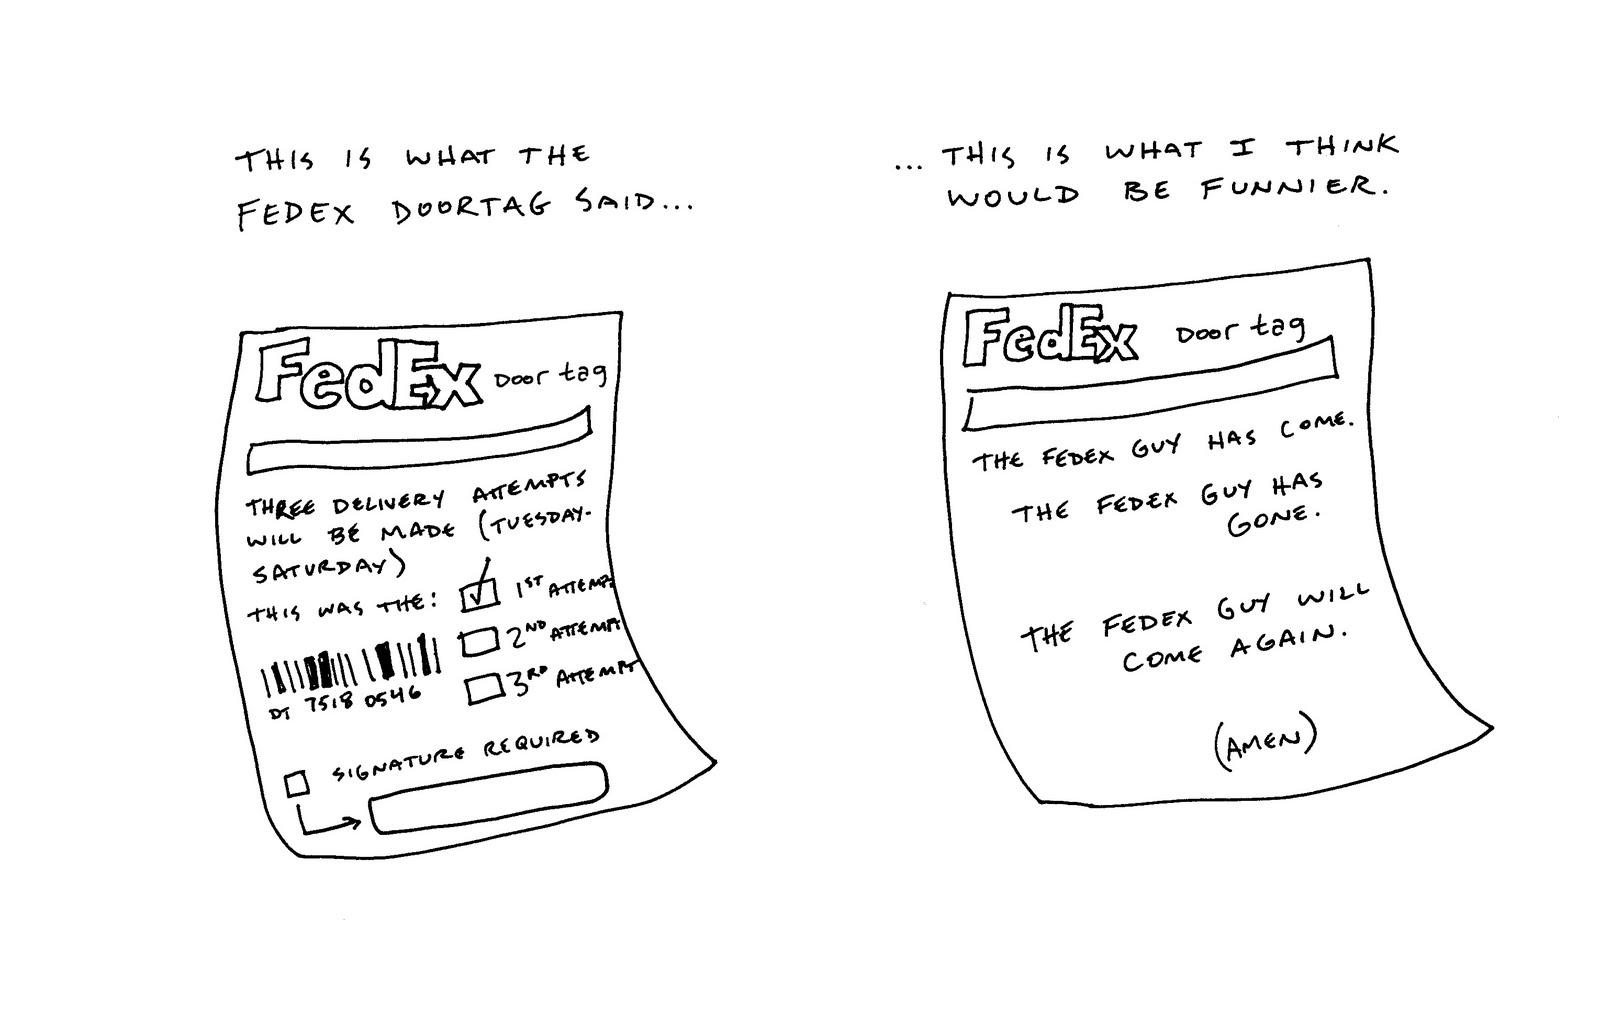 Fedex Door Tag Form. Fedex. Free Image About Wiring Diagram ...